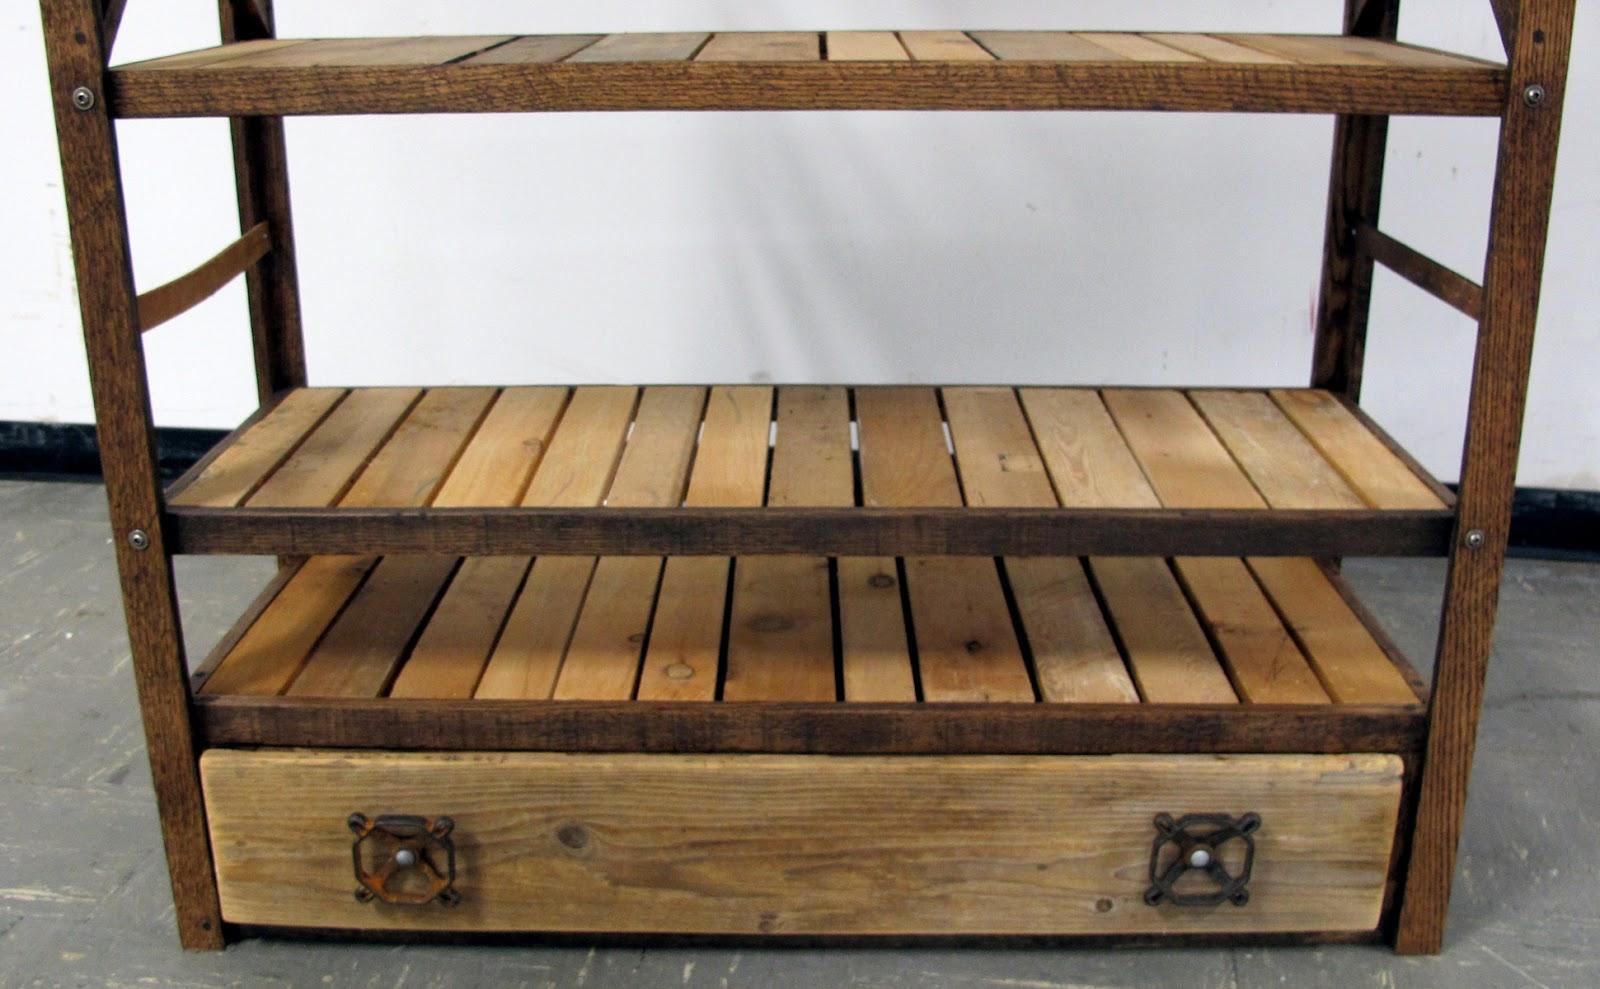 Reclaimed Wood Floating Shelves 12 Deep 16 Image Wall